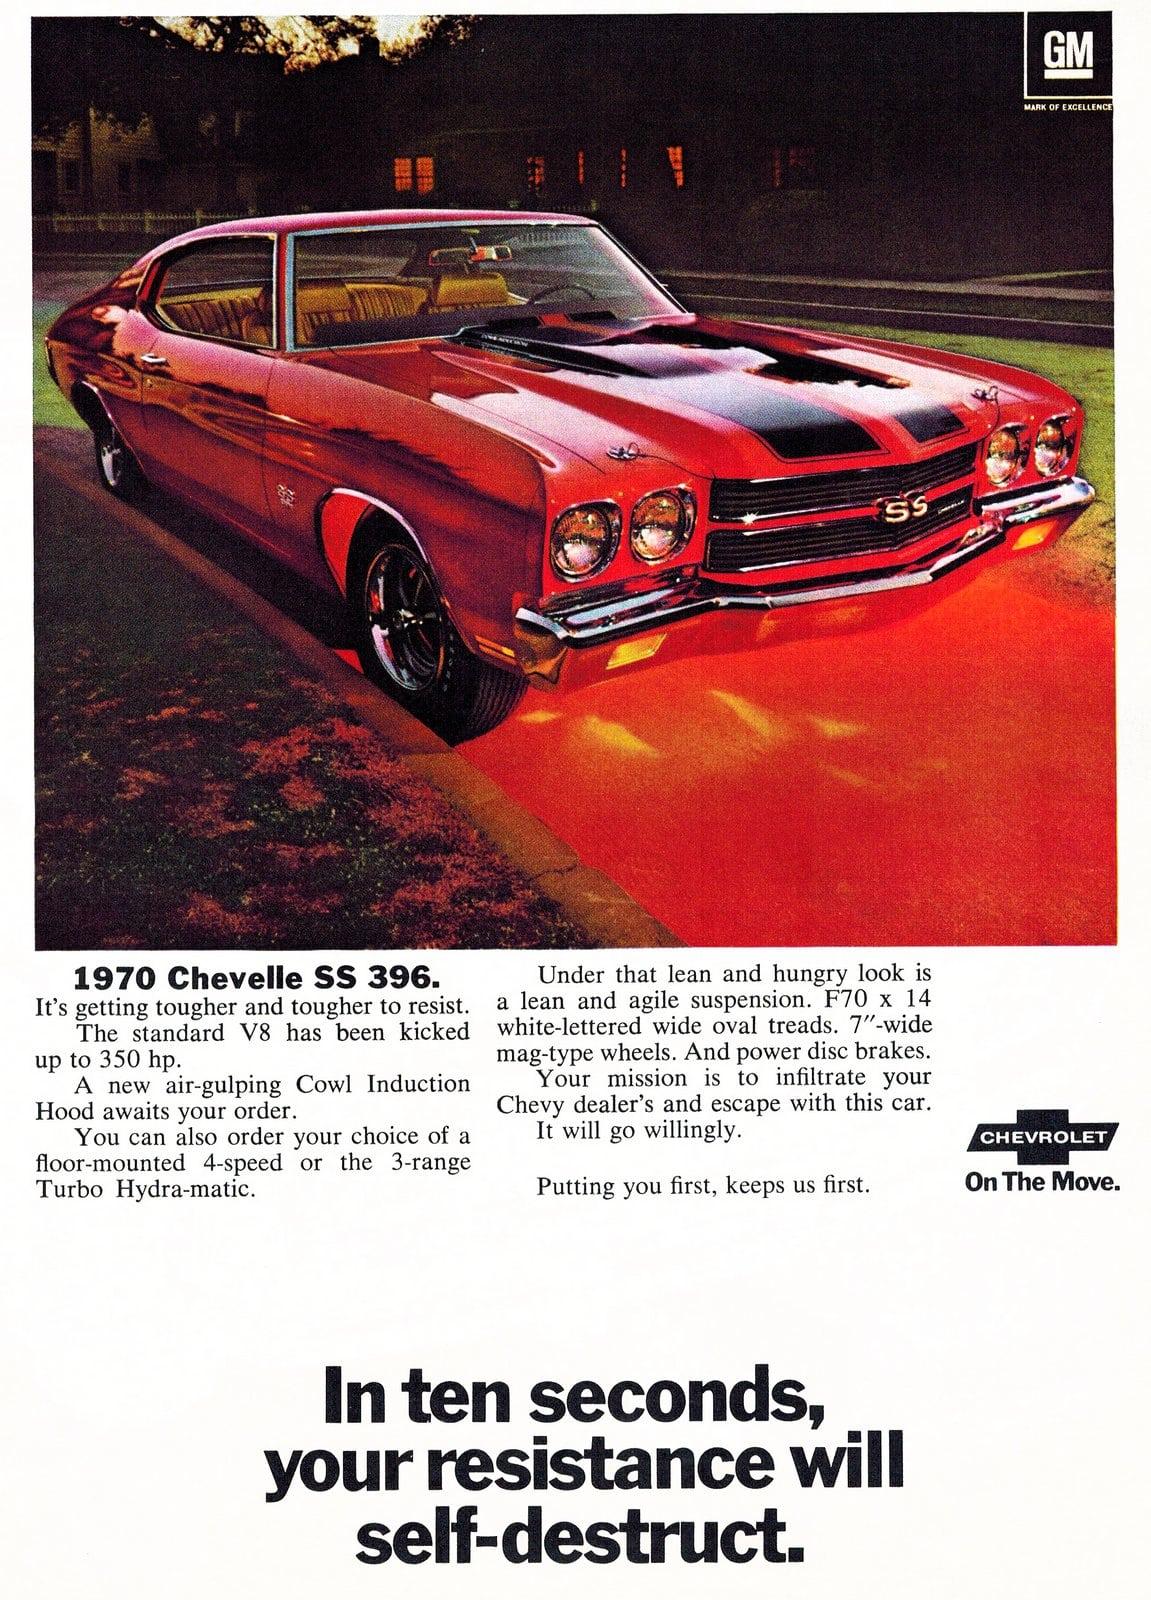 Classic 1970 Chevelle SS 396